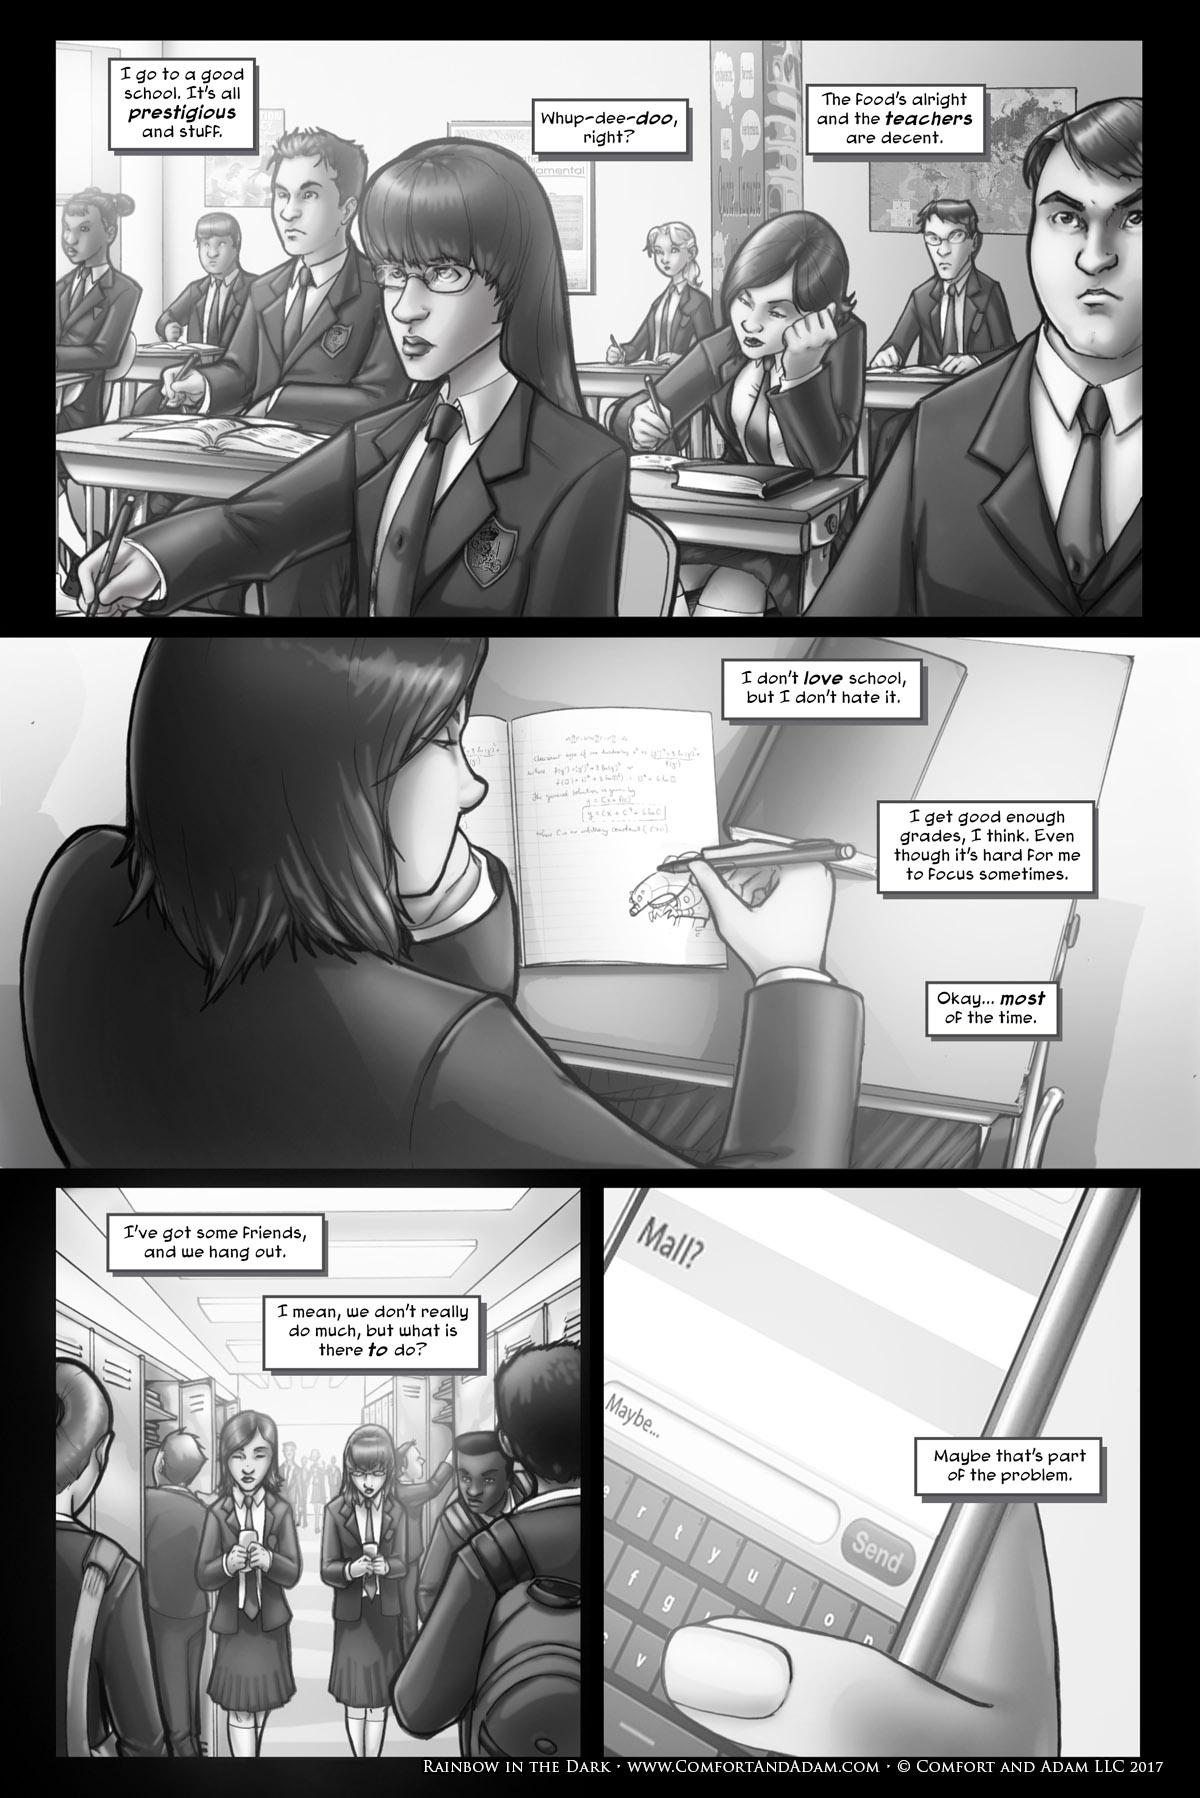 Rainbow in the Dark #1, pg. 3: High School Sucks